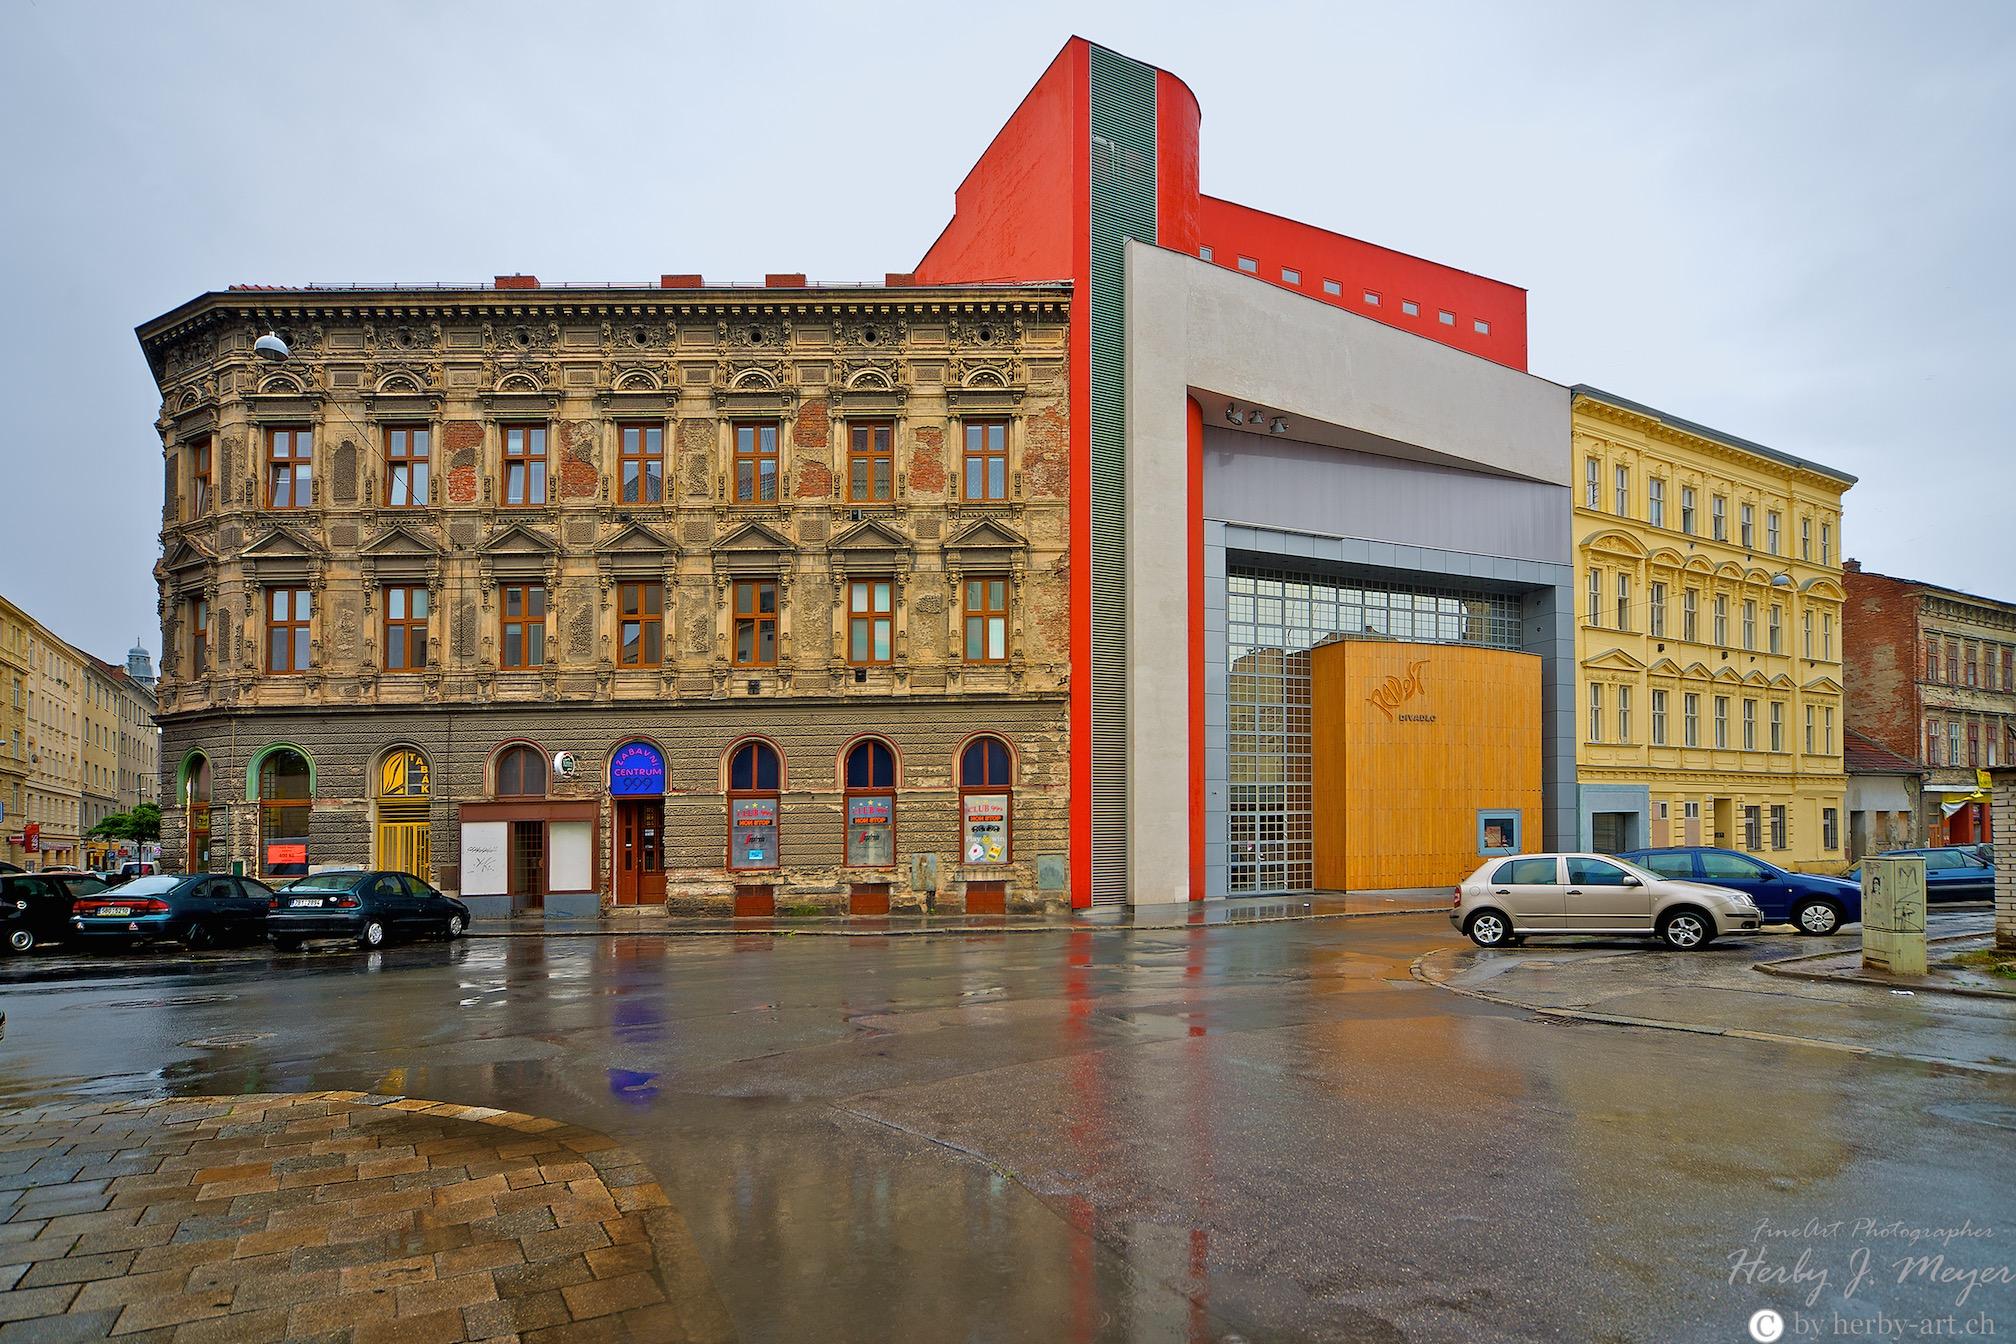 Eigen-Artig-Keiten_herby-art.ch_Divadlo_Radost_Brno_HJM_1398_14-21_MAG